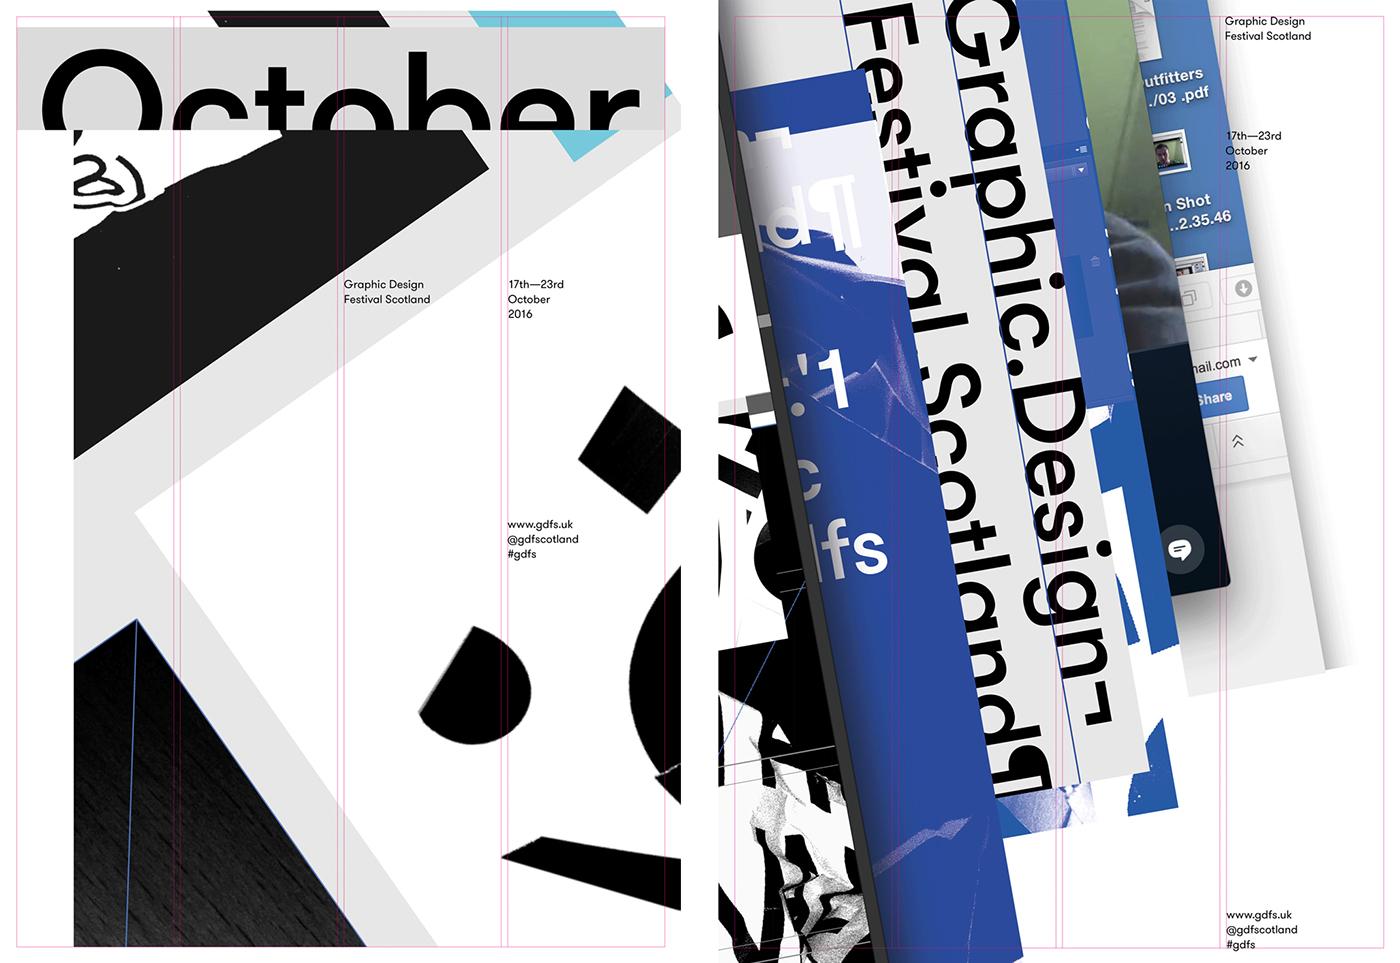 graphic design festival scotland freytaganderson Exhibition  identity Collaboration process Warriors Studio